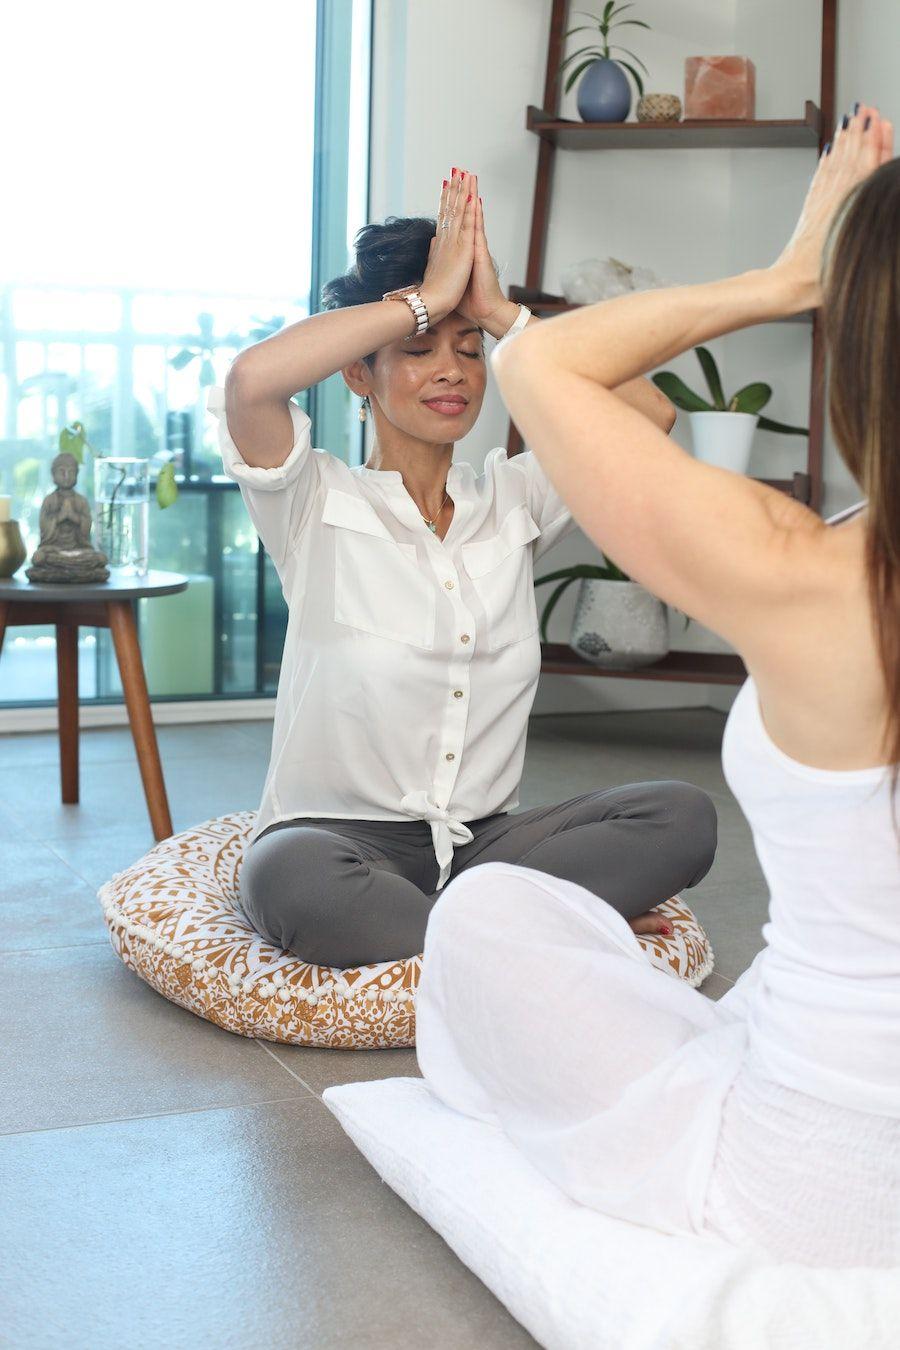 breathe meditation mindfulness busy professional